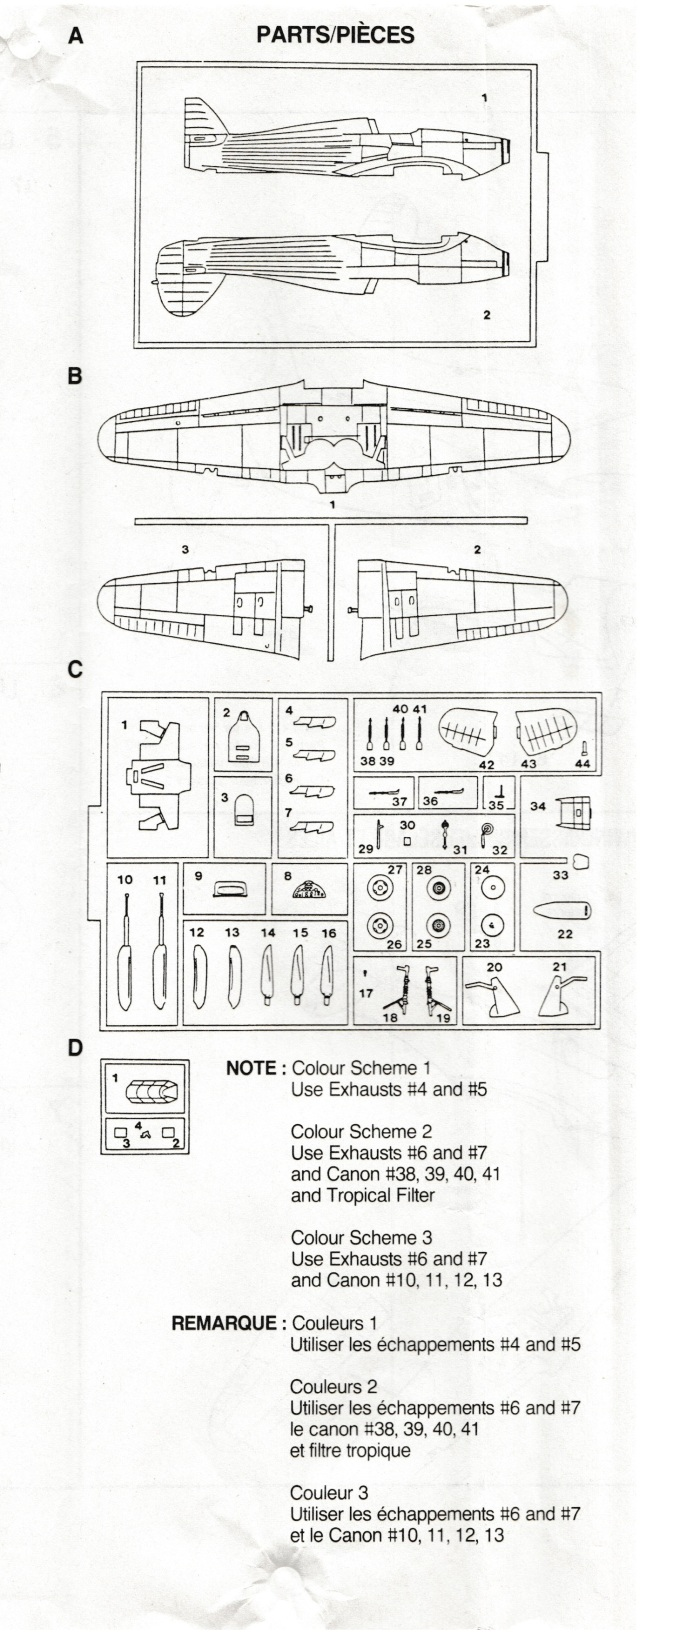 Hobbycraft Hurricane parts